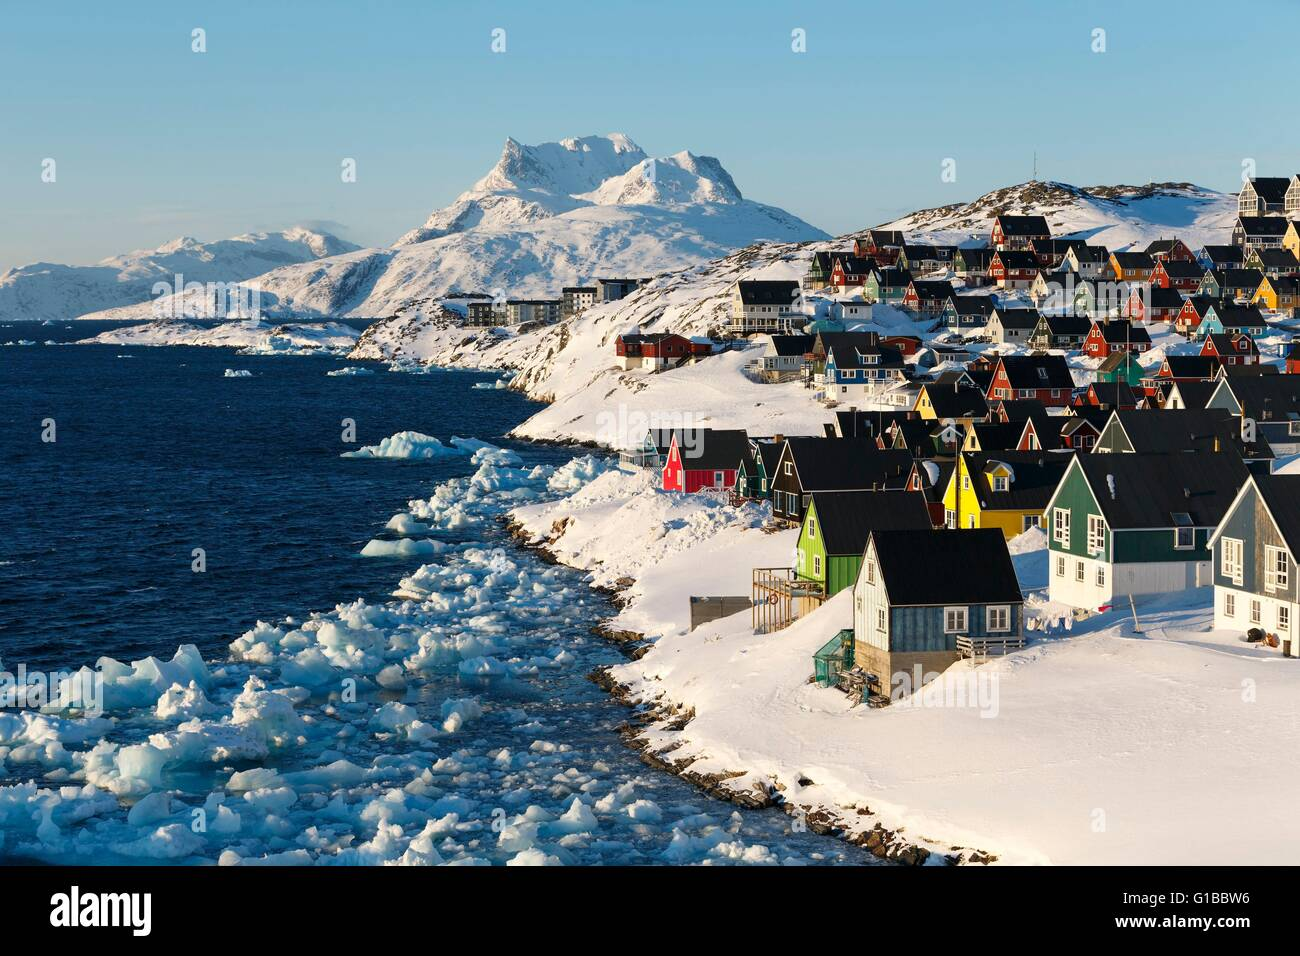 Groenlandia, Nuuk Foto stock - Alamy